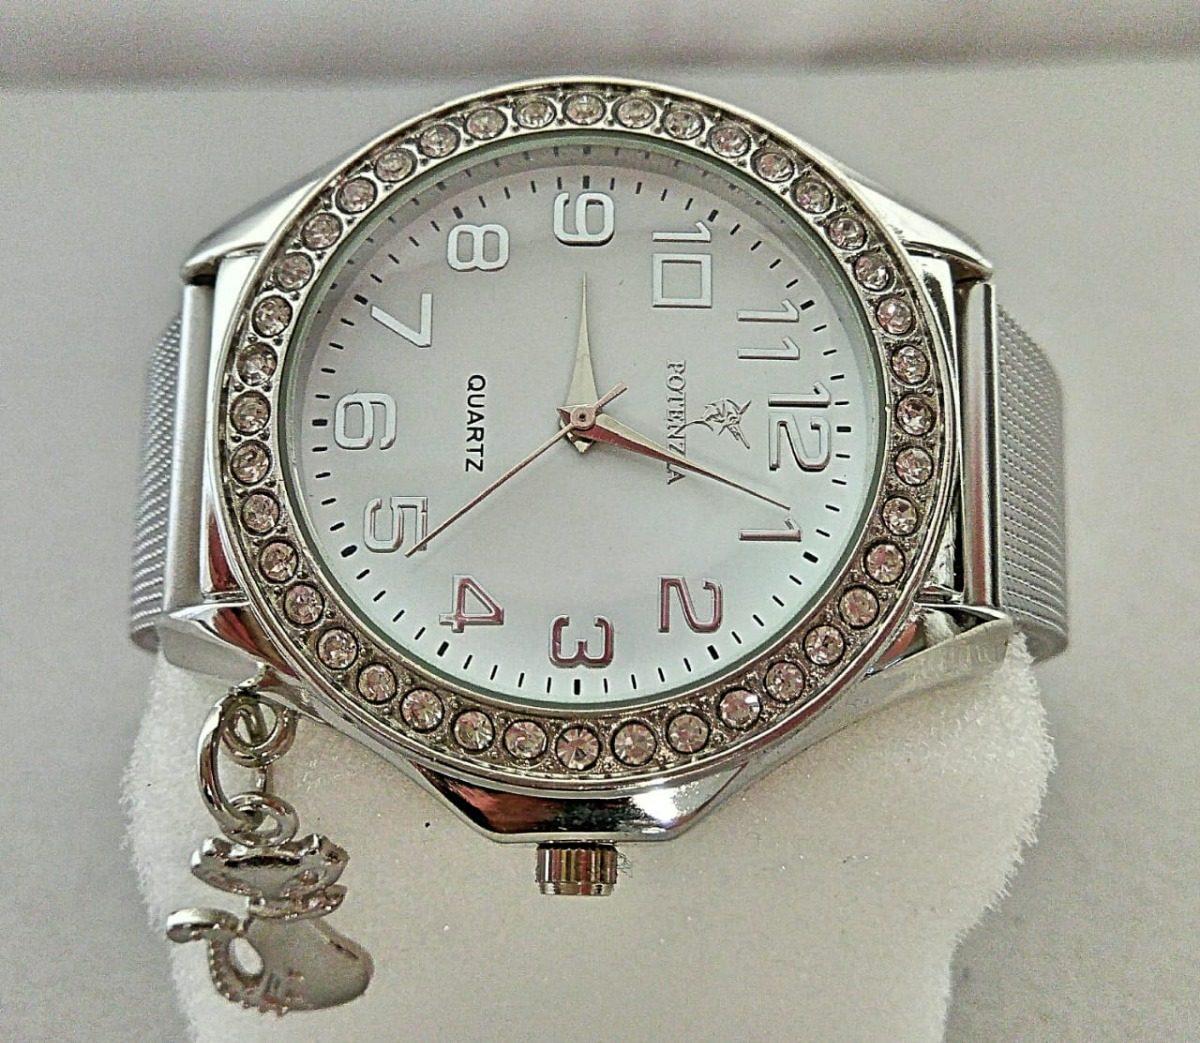 3174217ead6 relógio feminino de pulso luxuoso importado modelo novo moda. Carregando  zoom.